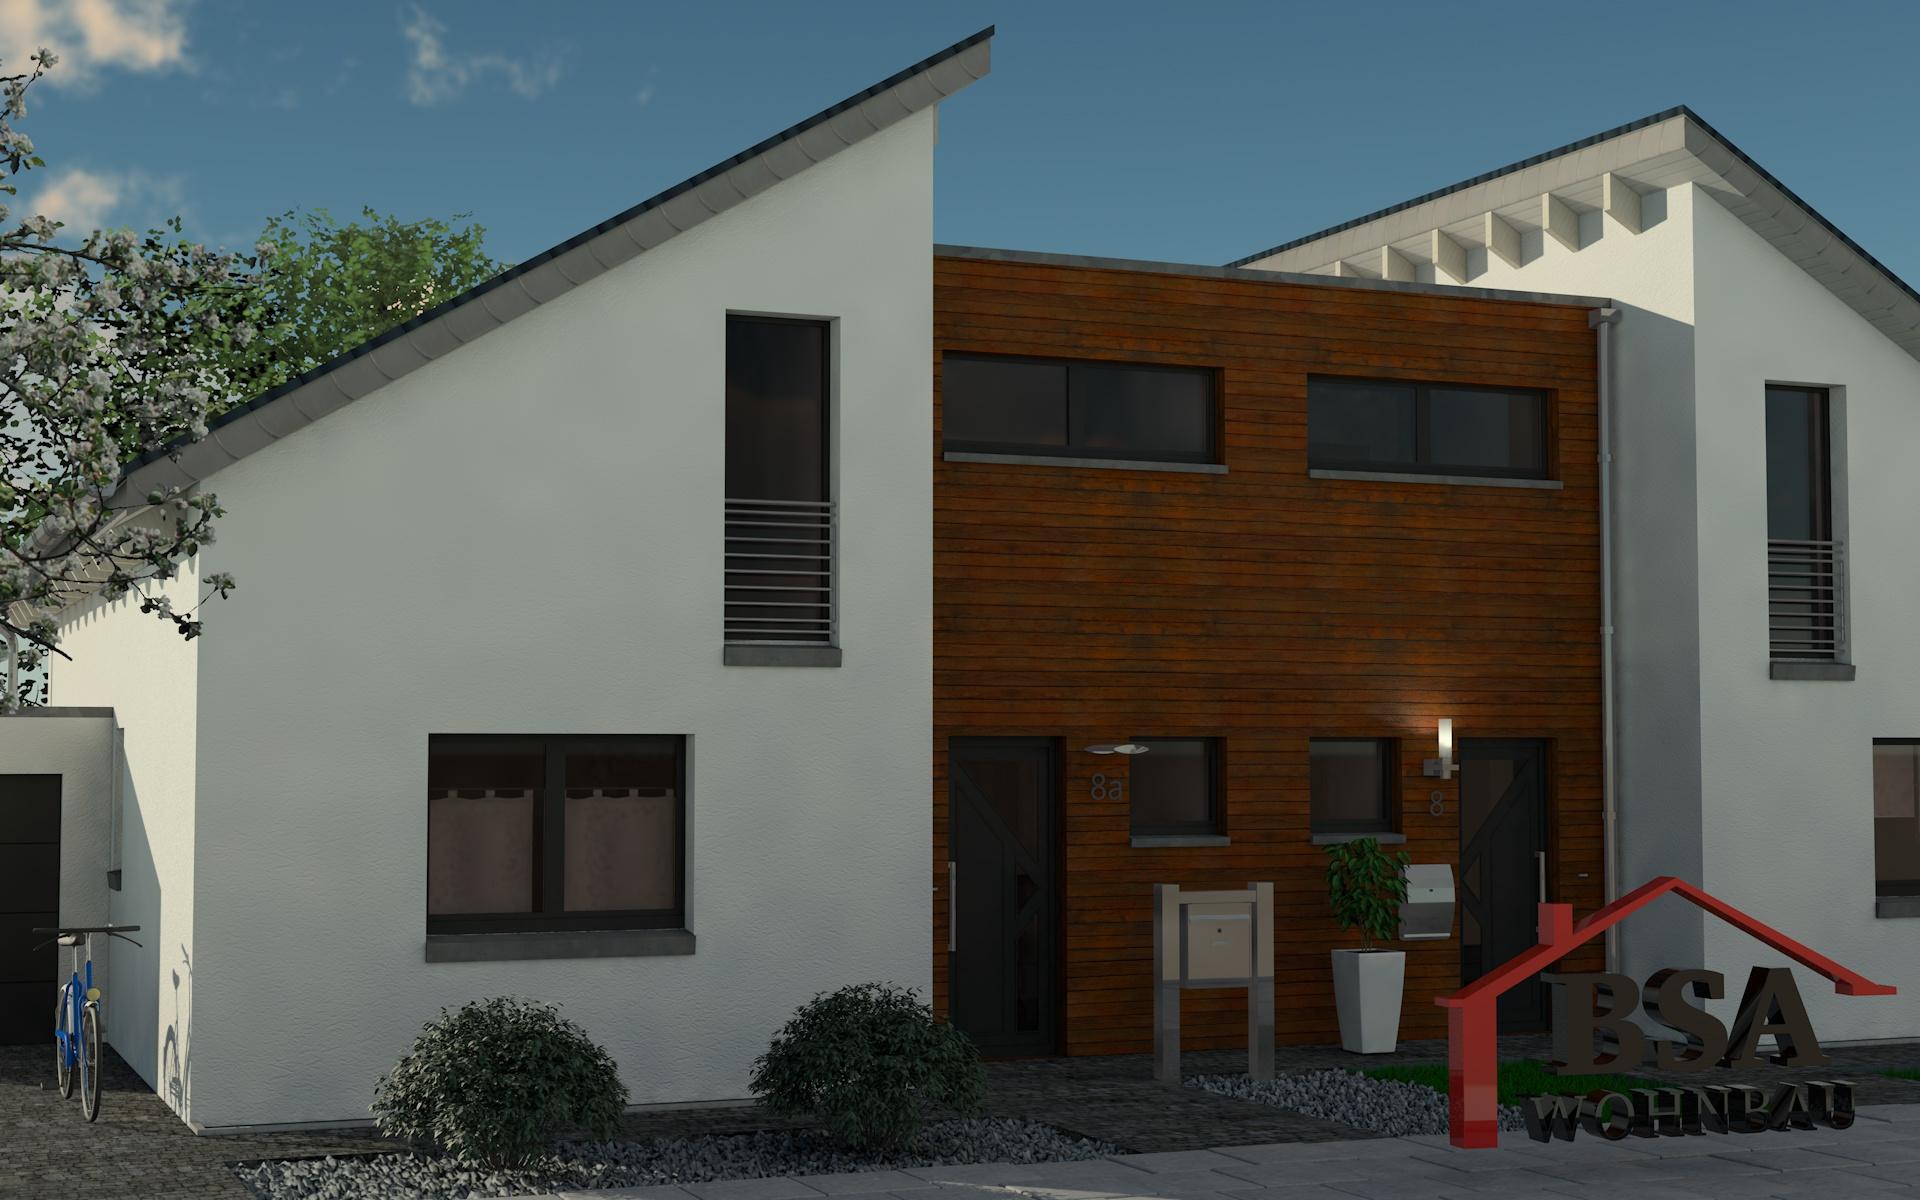 Turbo Creative 115 - BSA Wohnbau - kreatives Doppelhaus mit Pultdach AA91